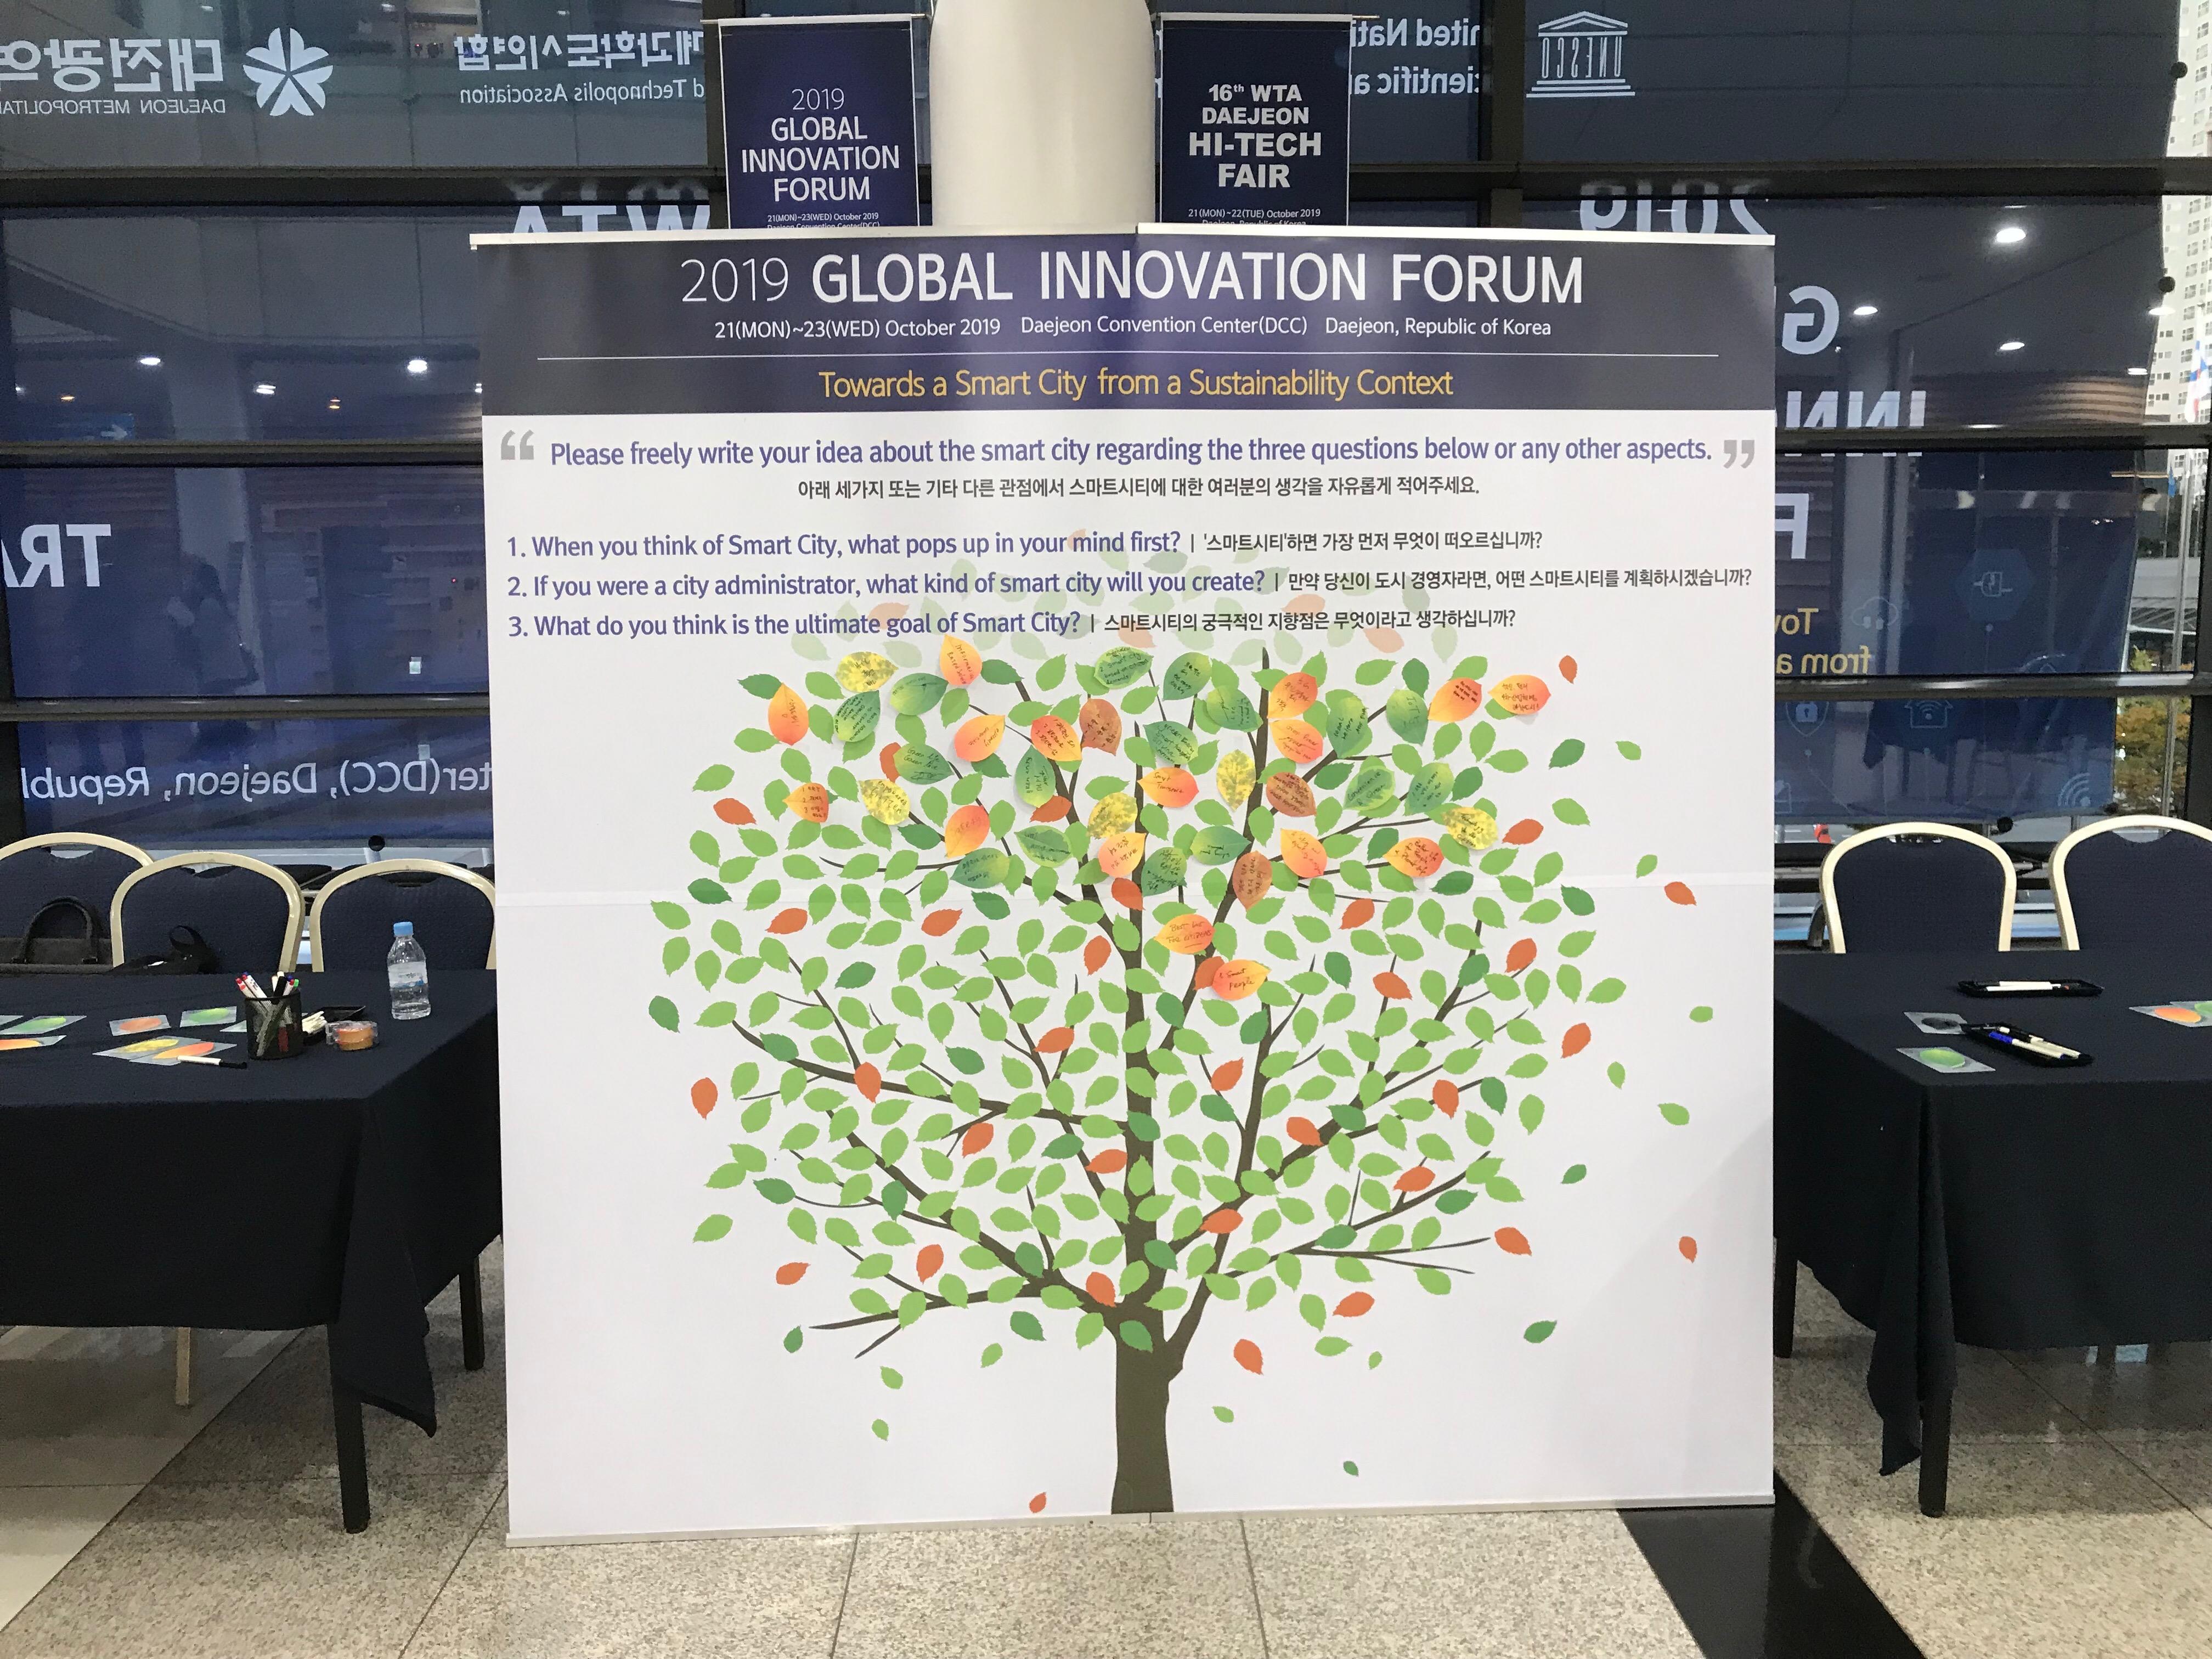 %e6%9e%97%e5%bb%ba%e5%85%83%e7%90%86%e4%ba%8b%e9%95%b7%e5%8f%97%e9%82%80%e5%8f%83%e5%8a%a0%e9%9f%93%e5%9c%8b2019-global-innovation-forum